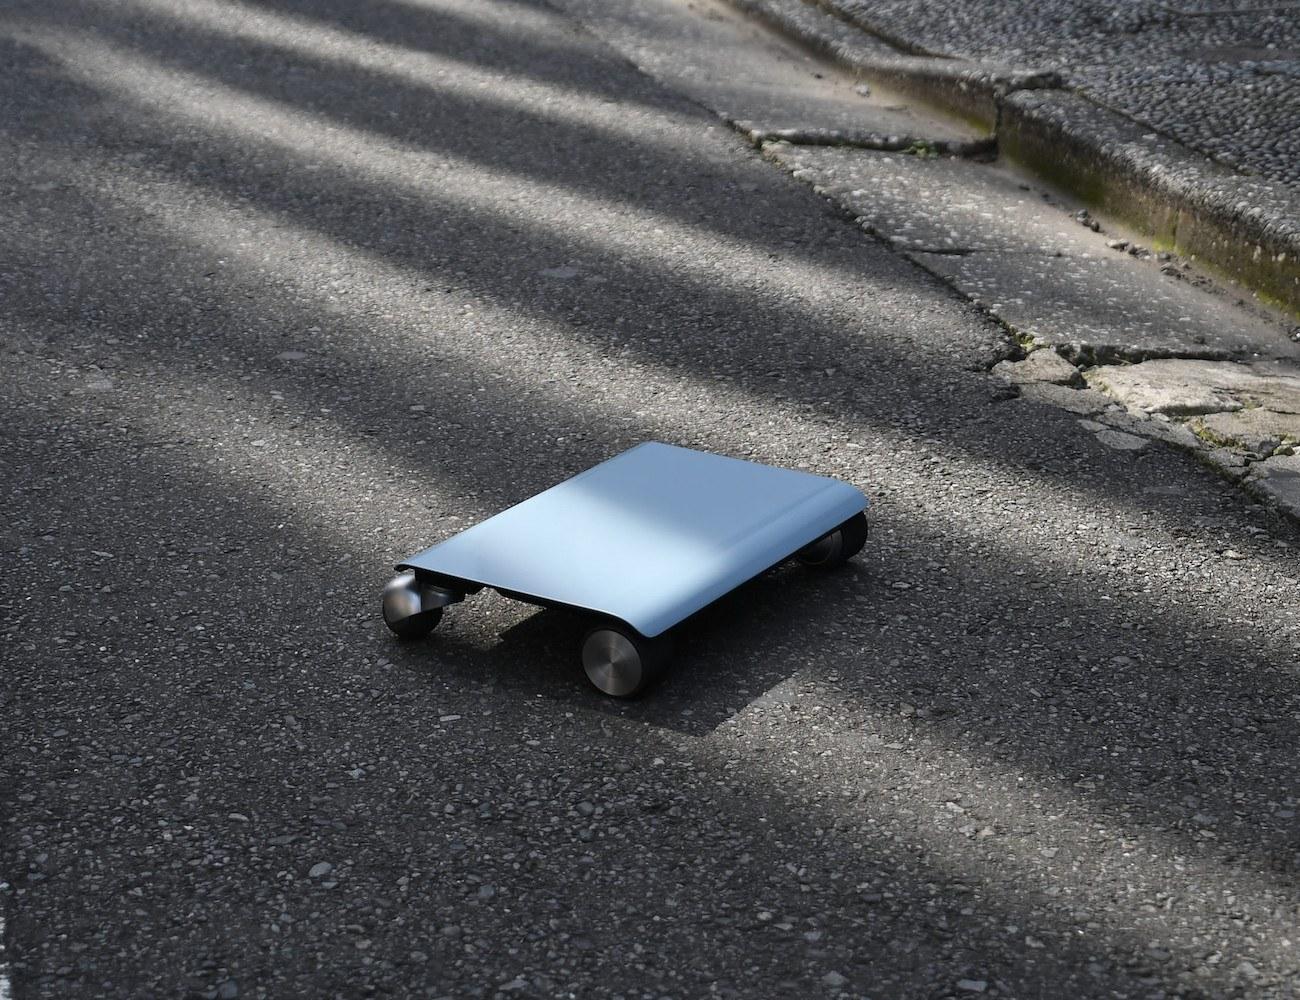 Walkcar Electronic Vehicle Platform